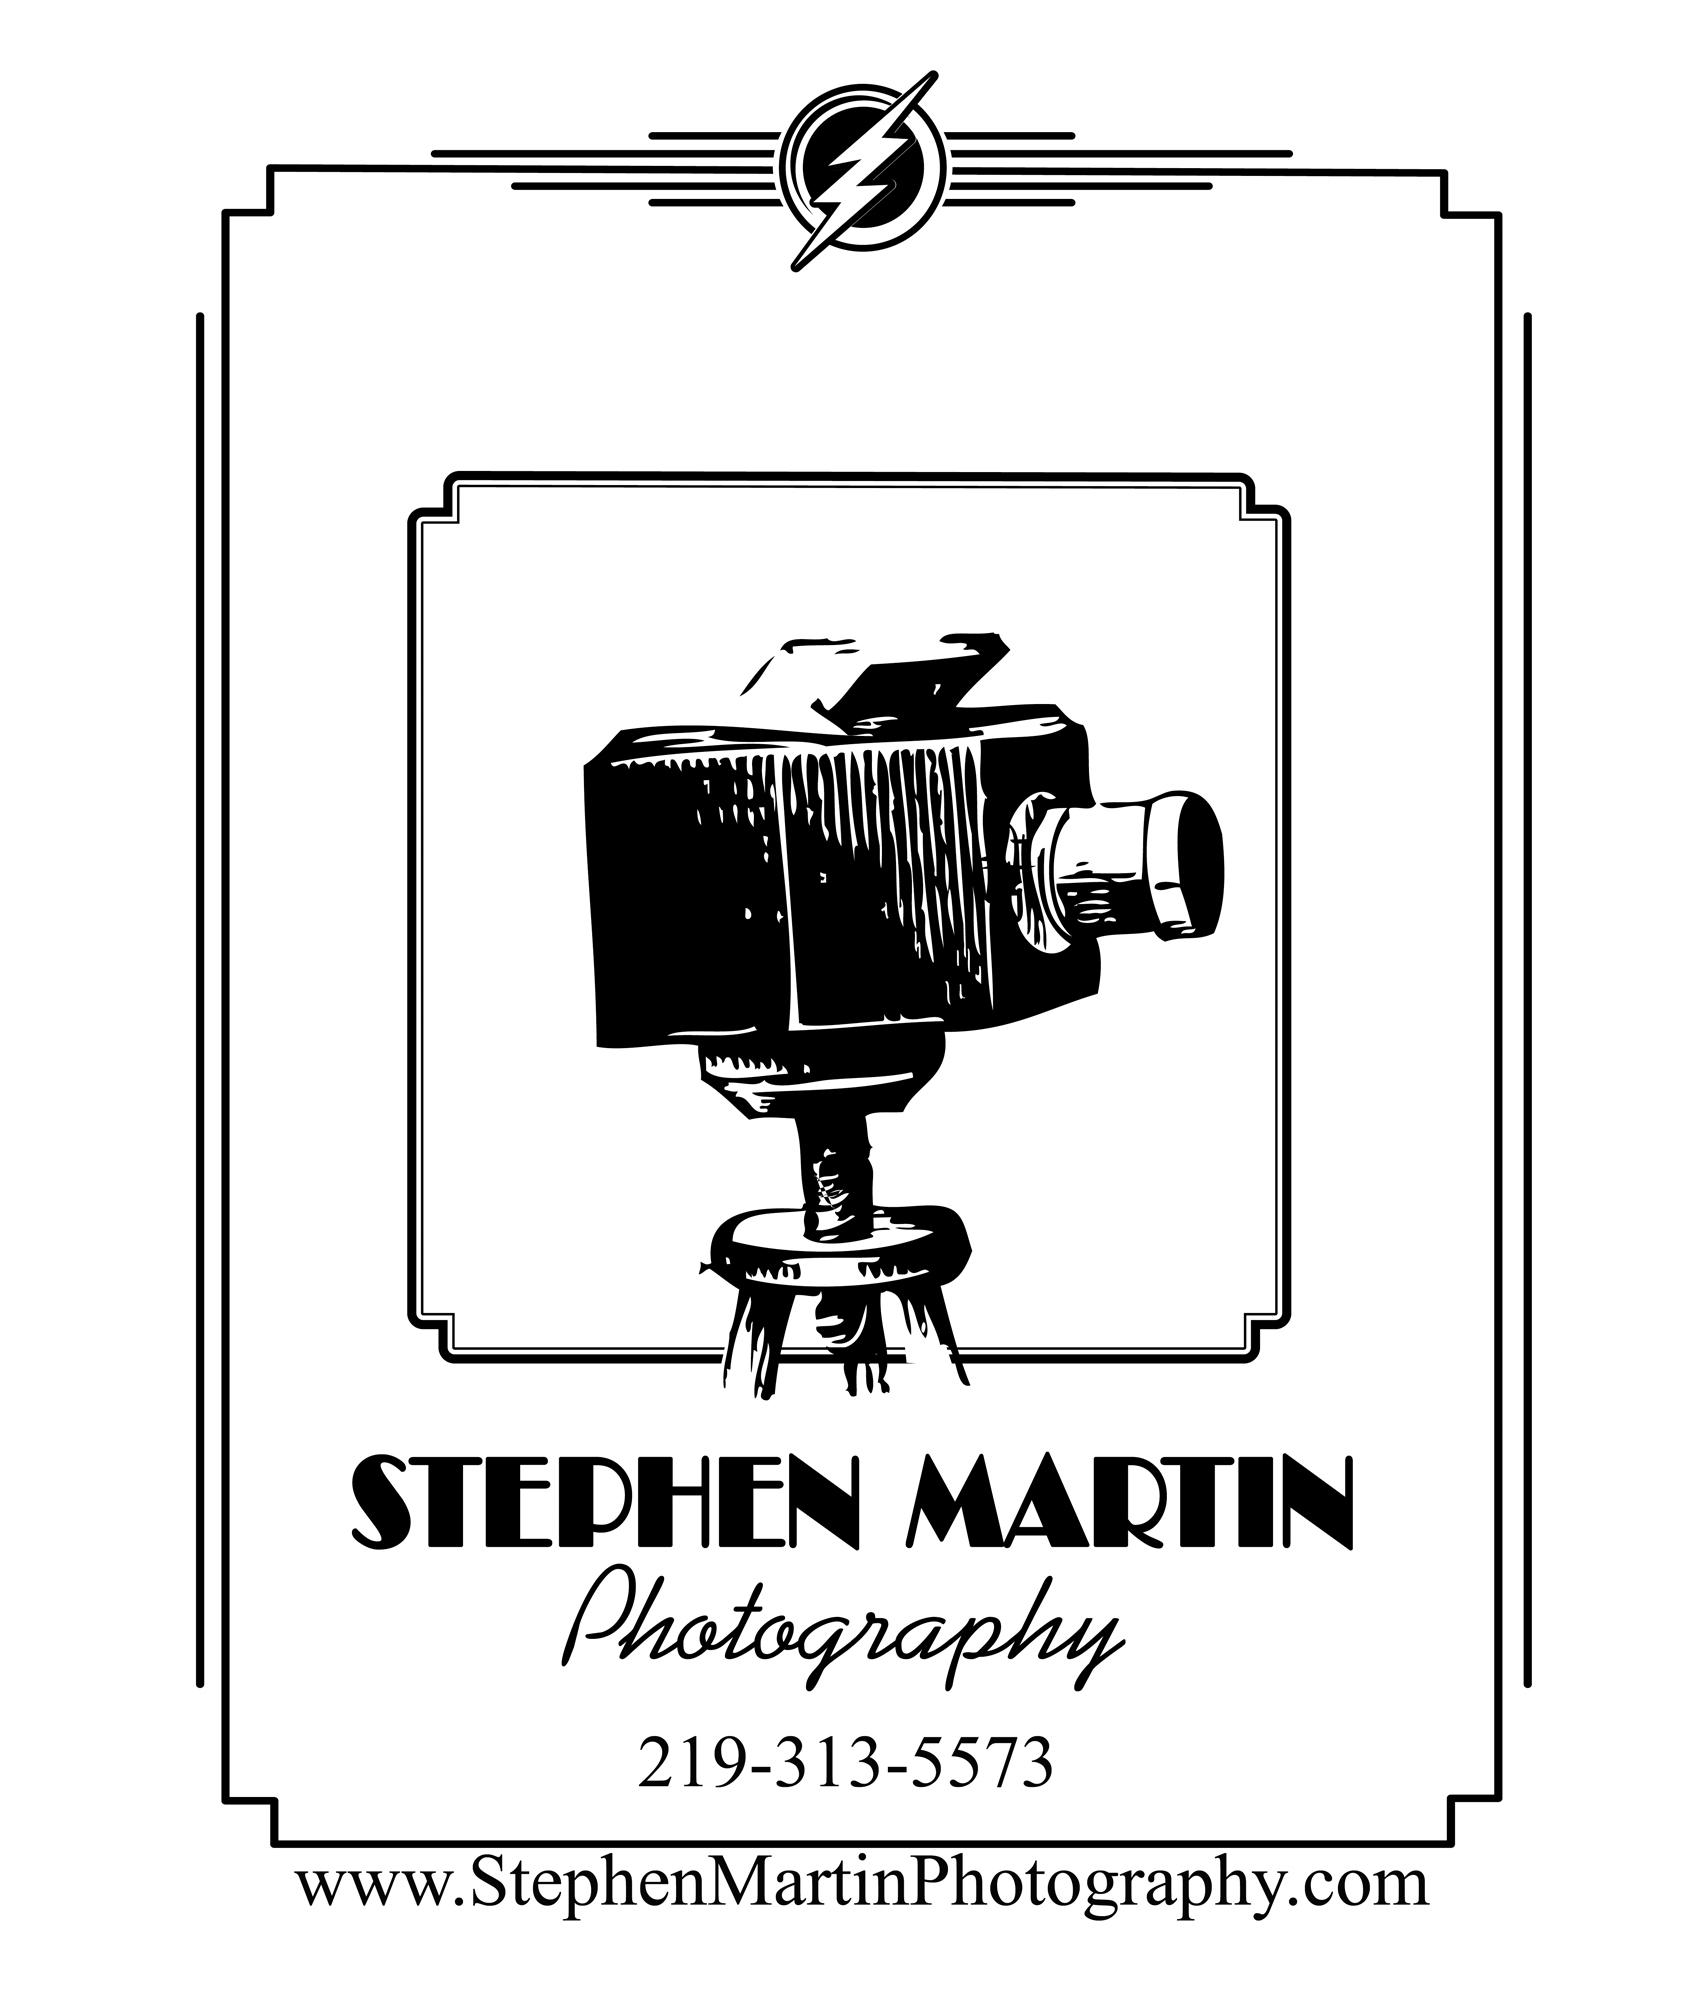 Stephen Martin Photography at PhotoReflect.com